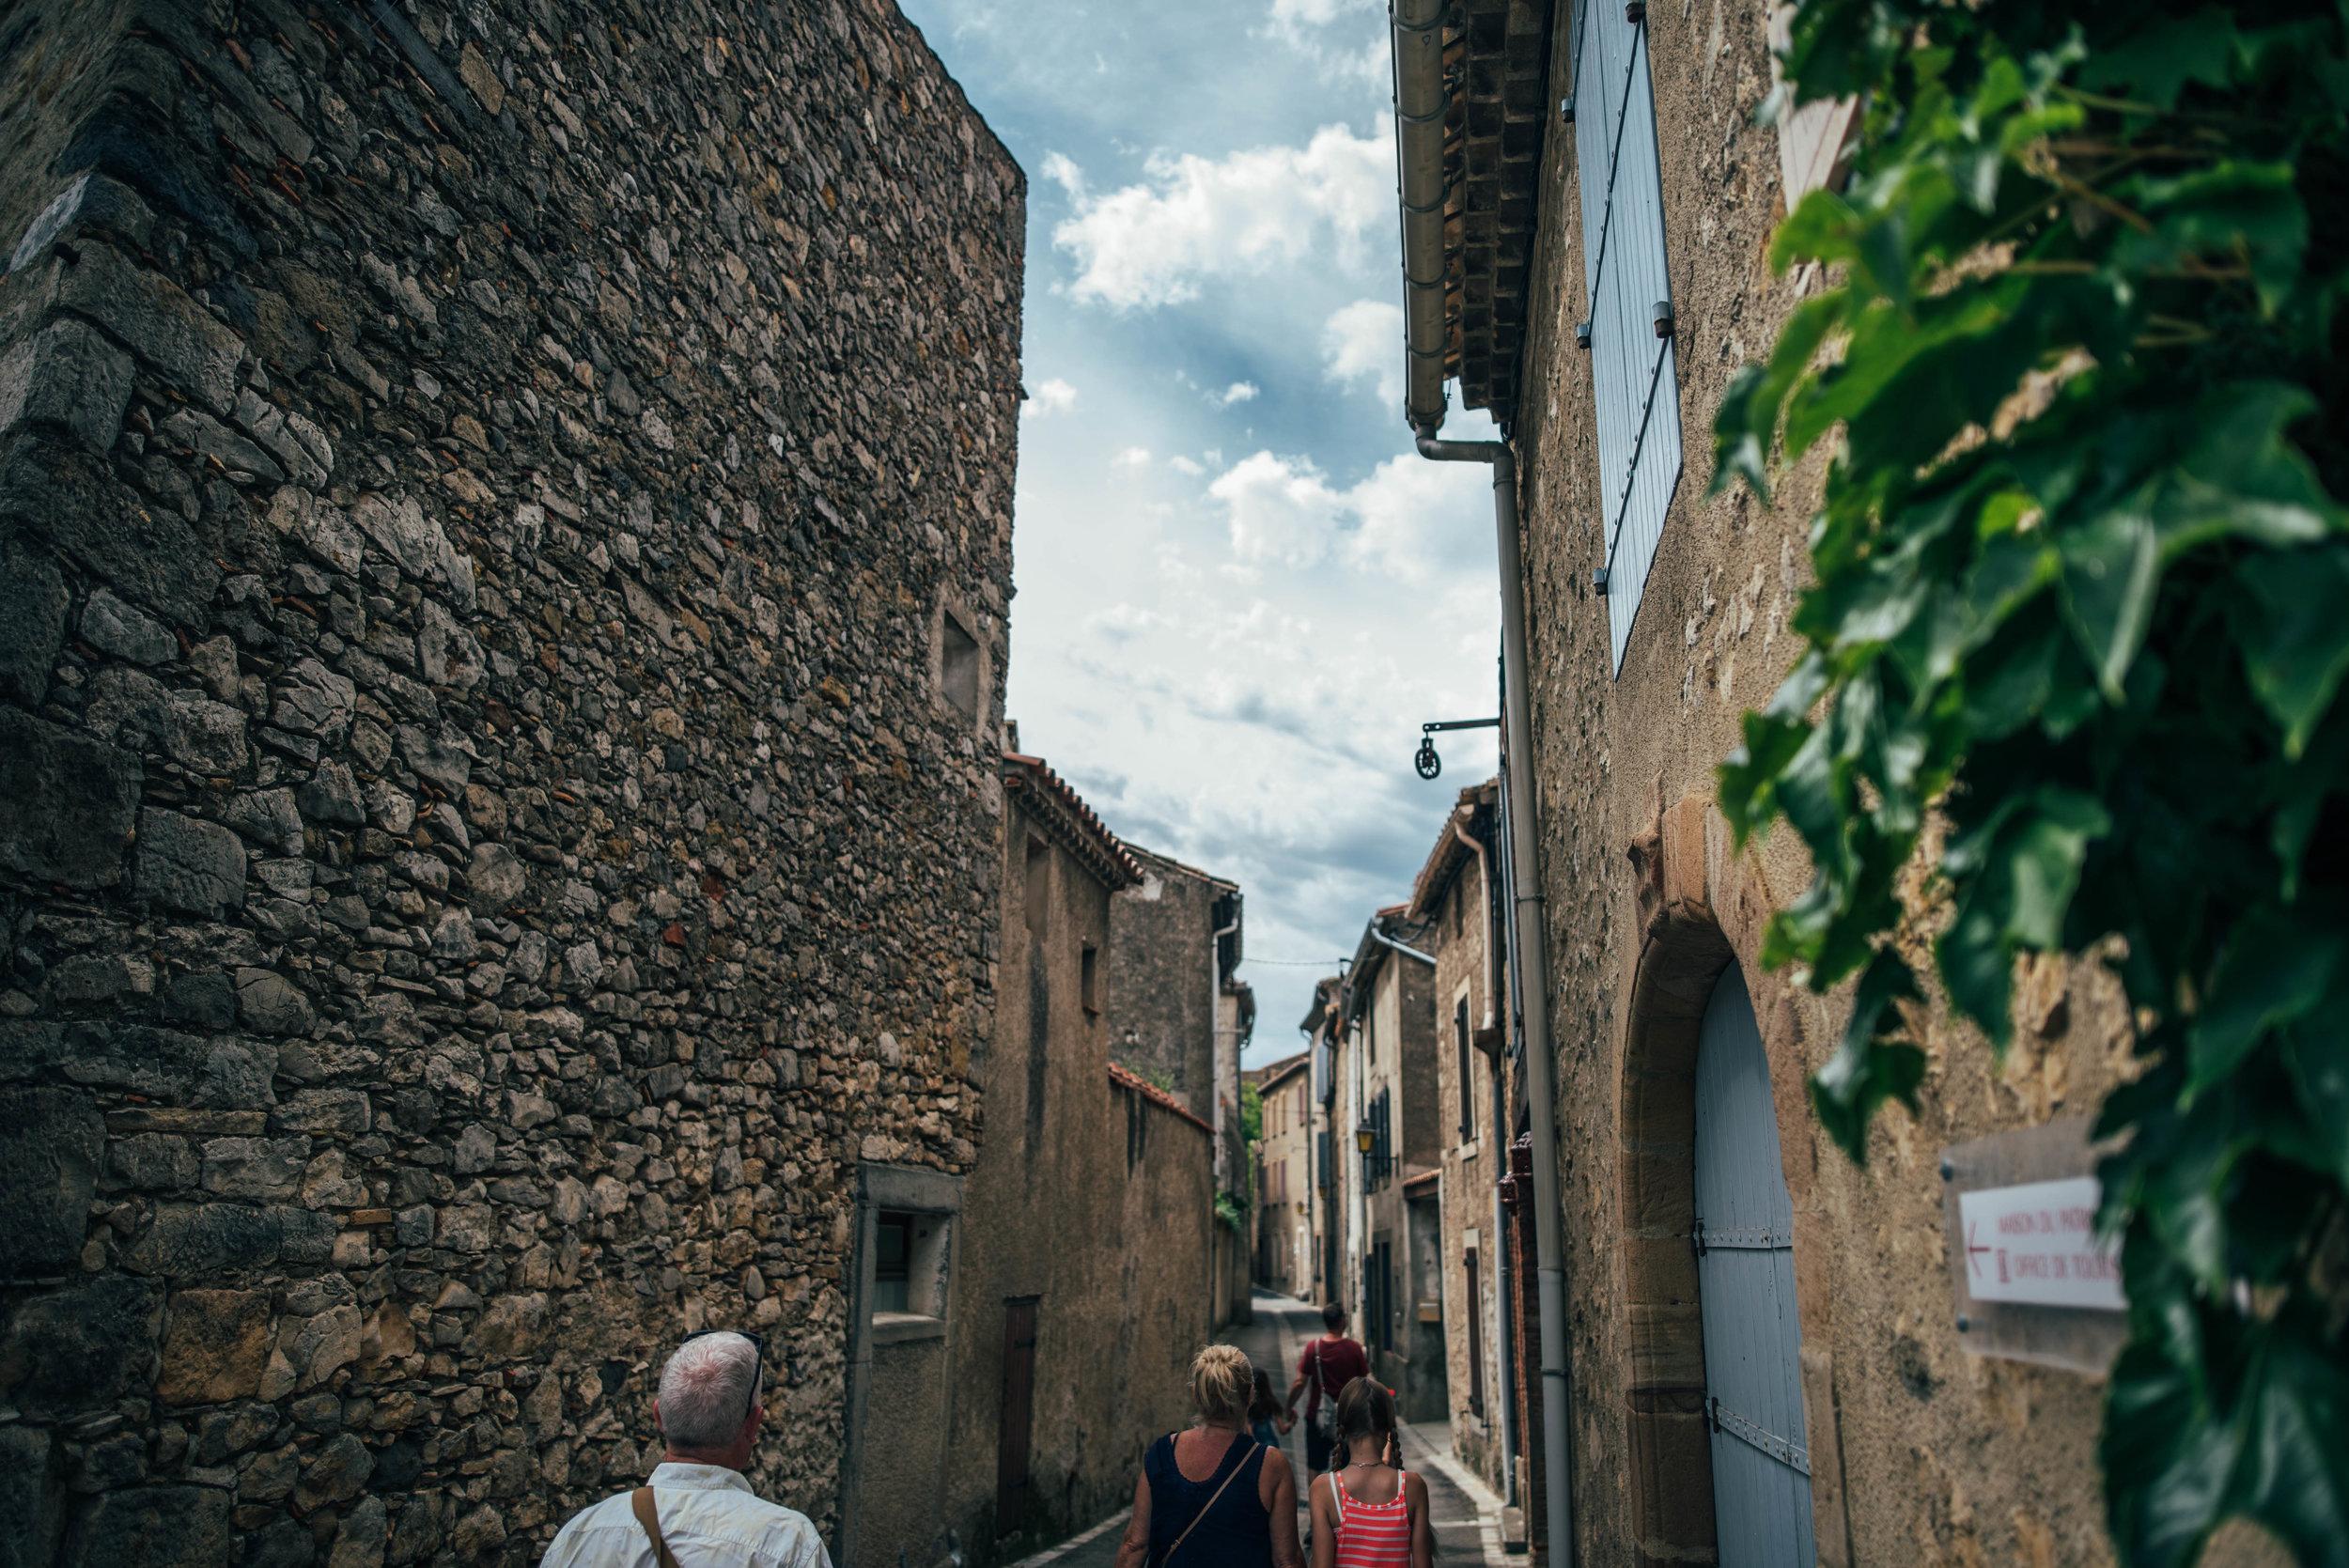 Streets of Lagrasse France Essex UK Documentary Photographer